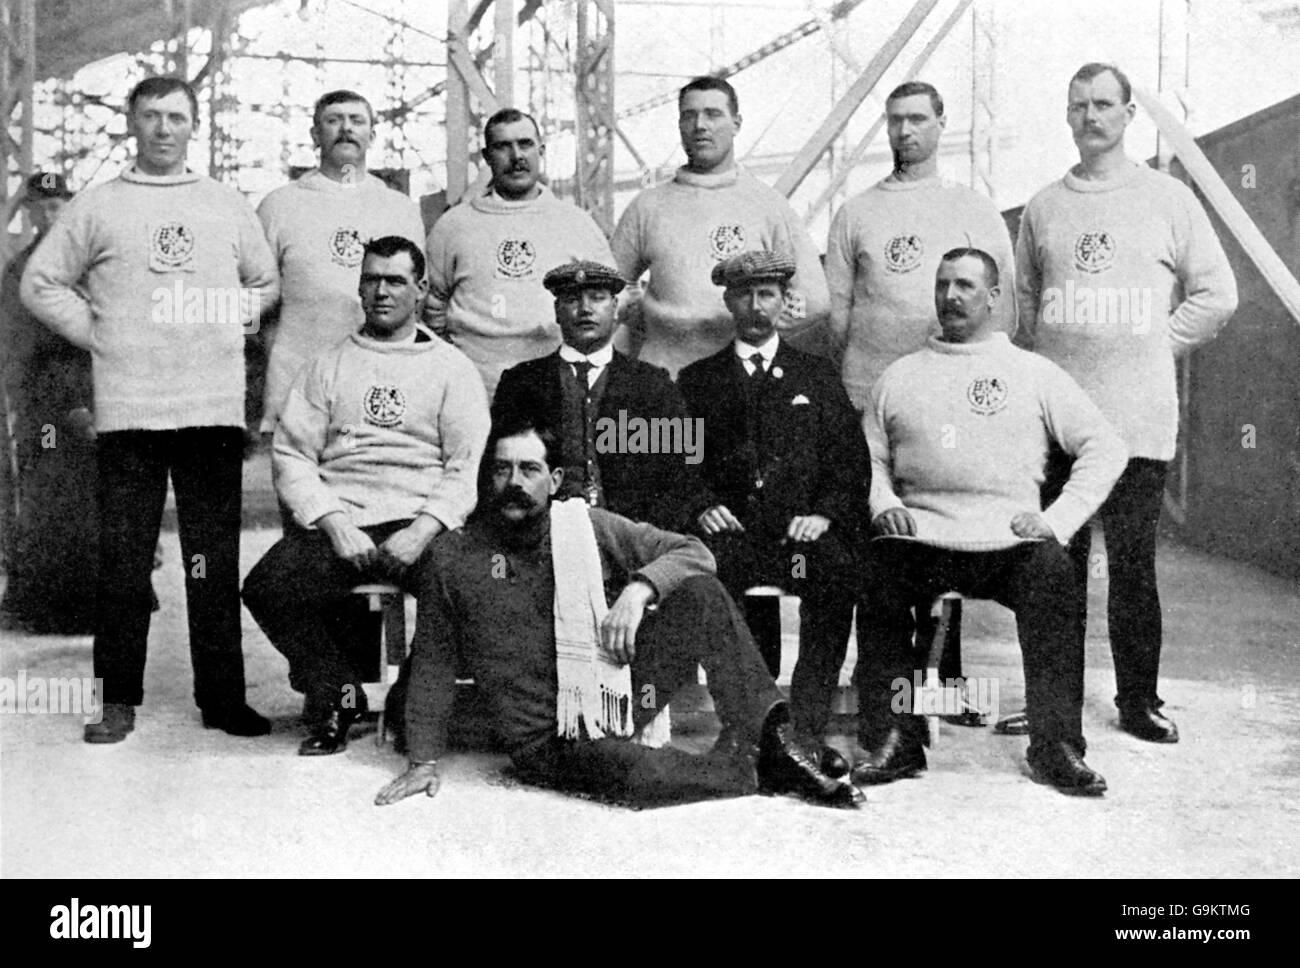 Athletics - London Olympic Games 1908 - Tug of War - Stock Image